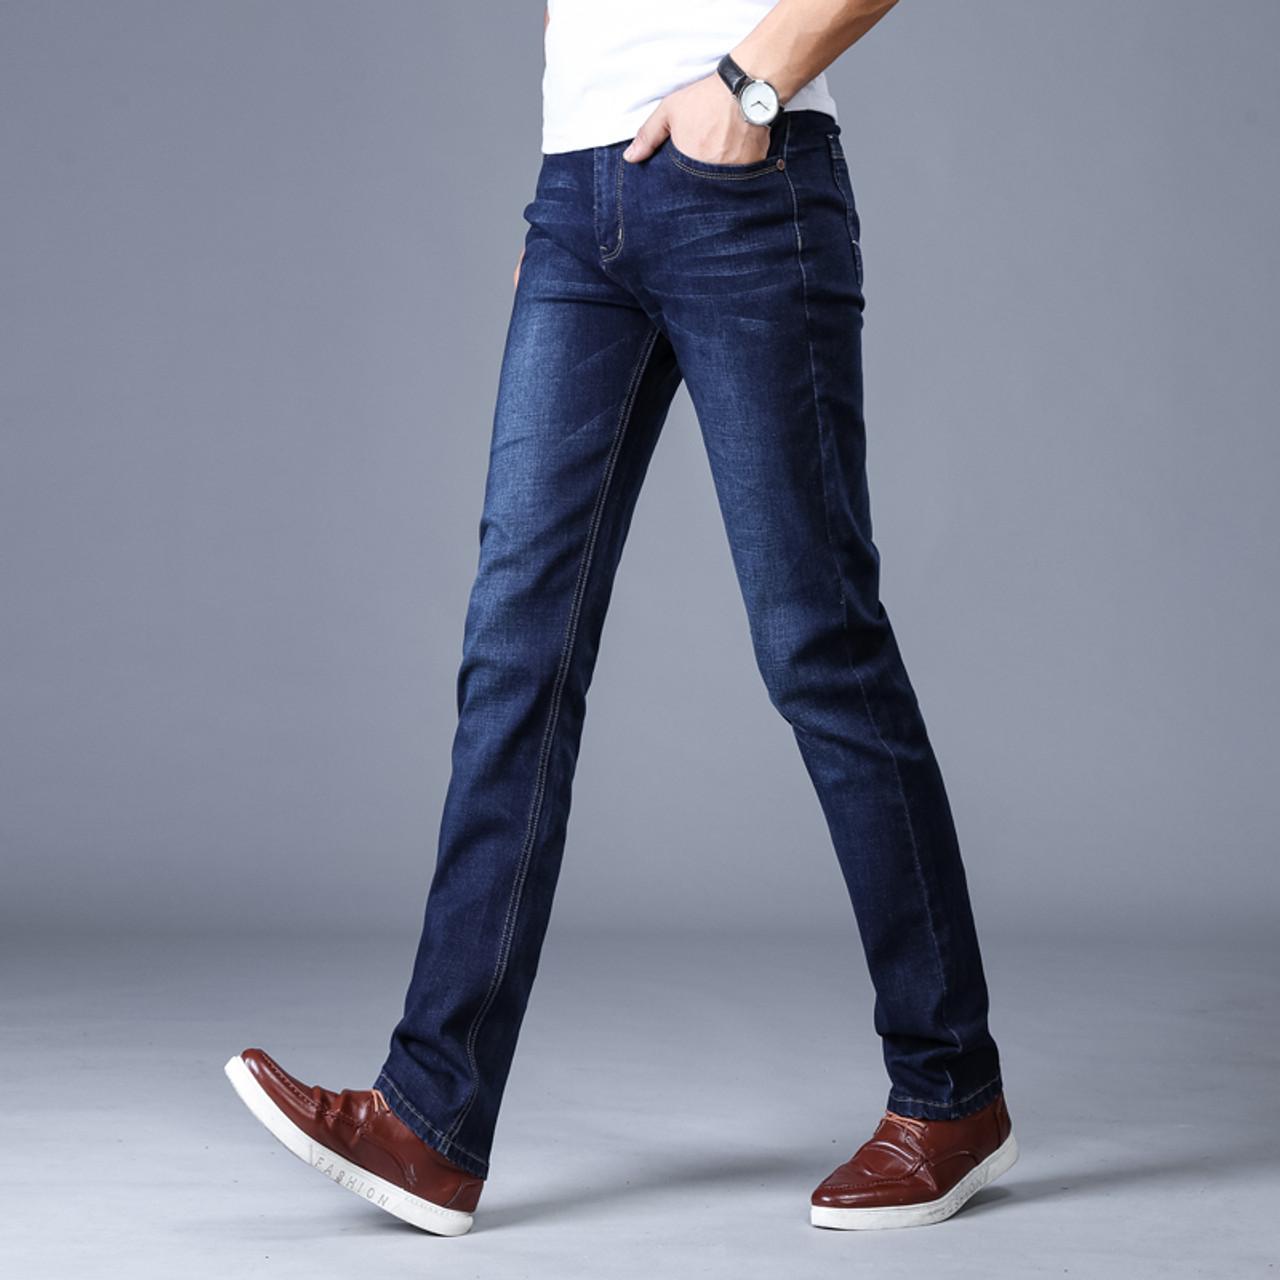 talla 40 a2f06 ccaff Men'S Classic Jeans Brand Large Size Straight Pantalon Homme Jean Slim  Distressed Design Biker Pants Fit Cheap Black Regular